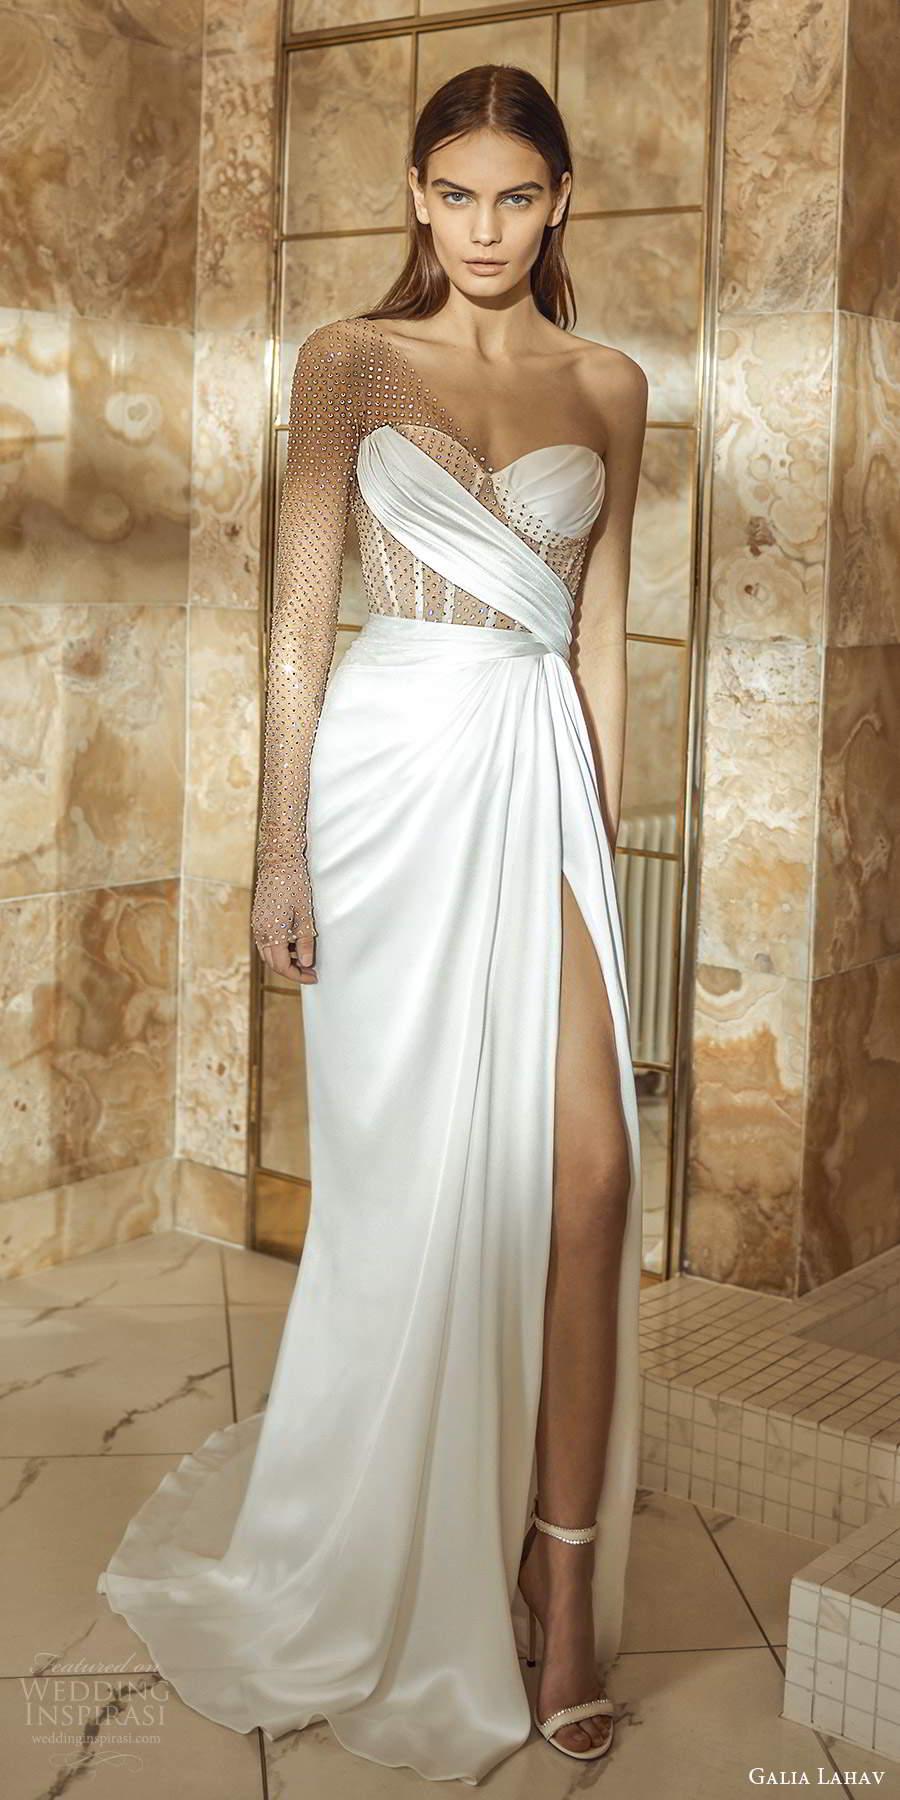 galia lahav fall 2021 bridal one shoulder long sleeve sweetheart neckline embellished bodice sheath wedding dress slit skirt (1) mv